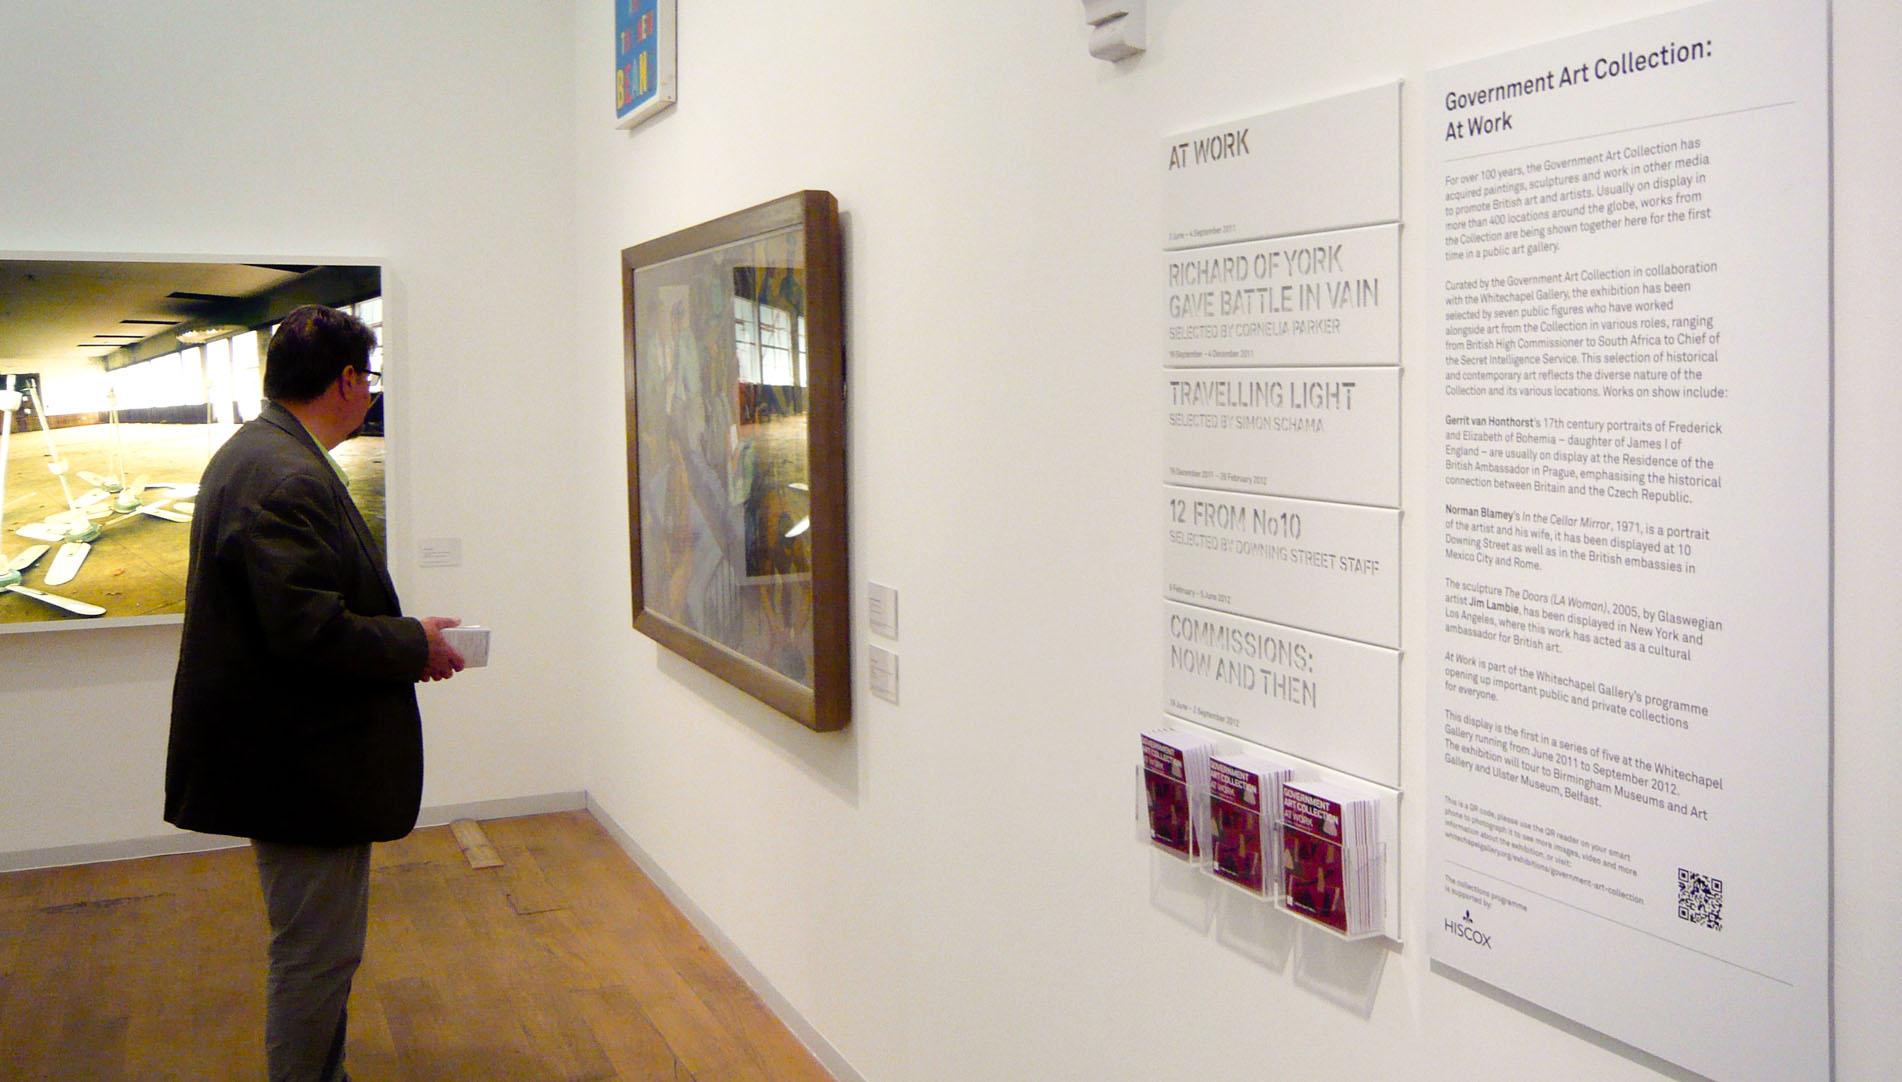 GAC Revealed, Whitechapel Gallery